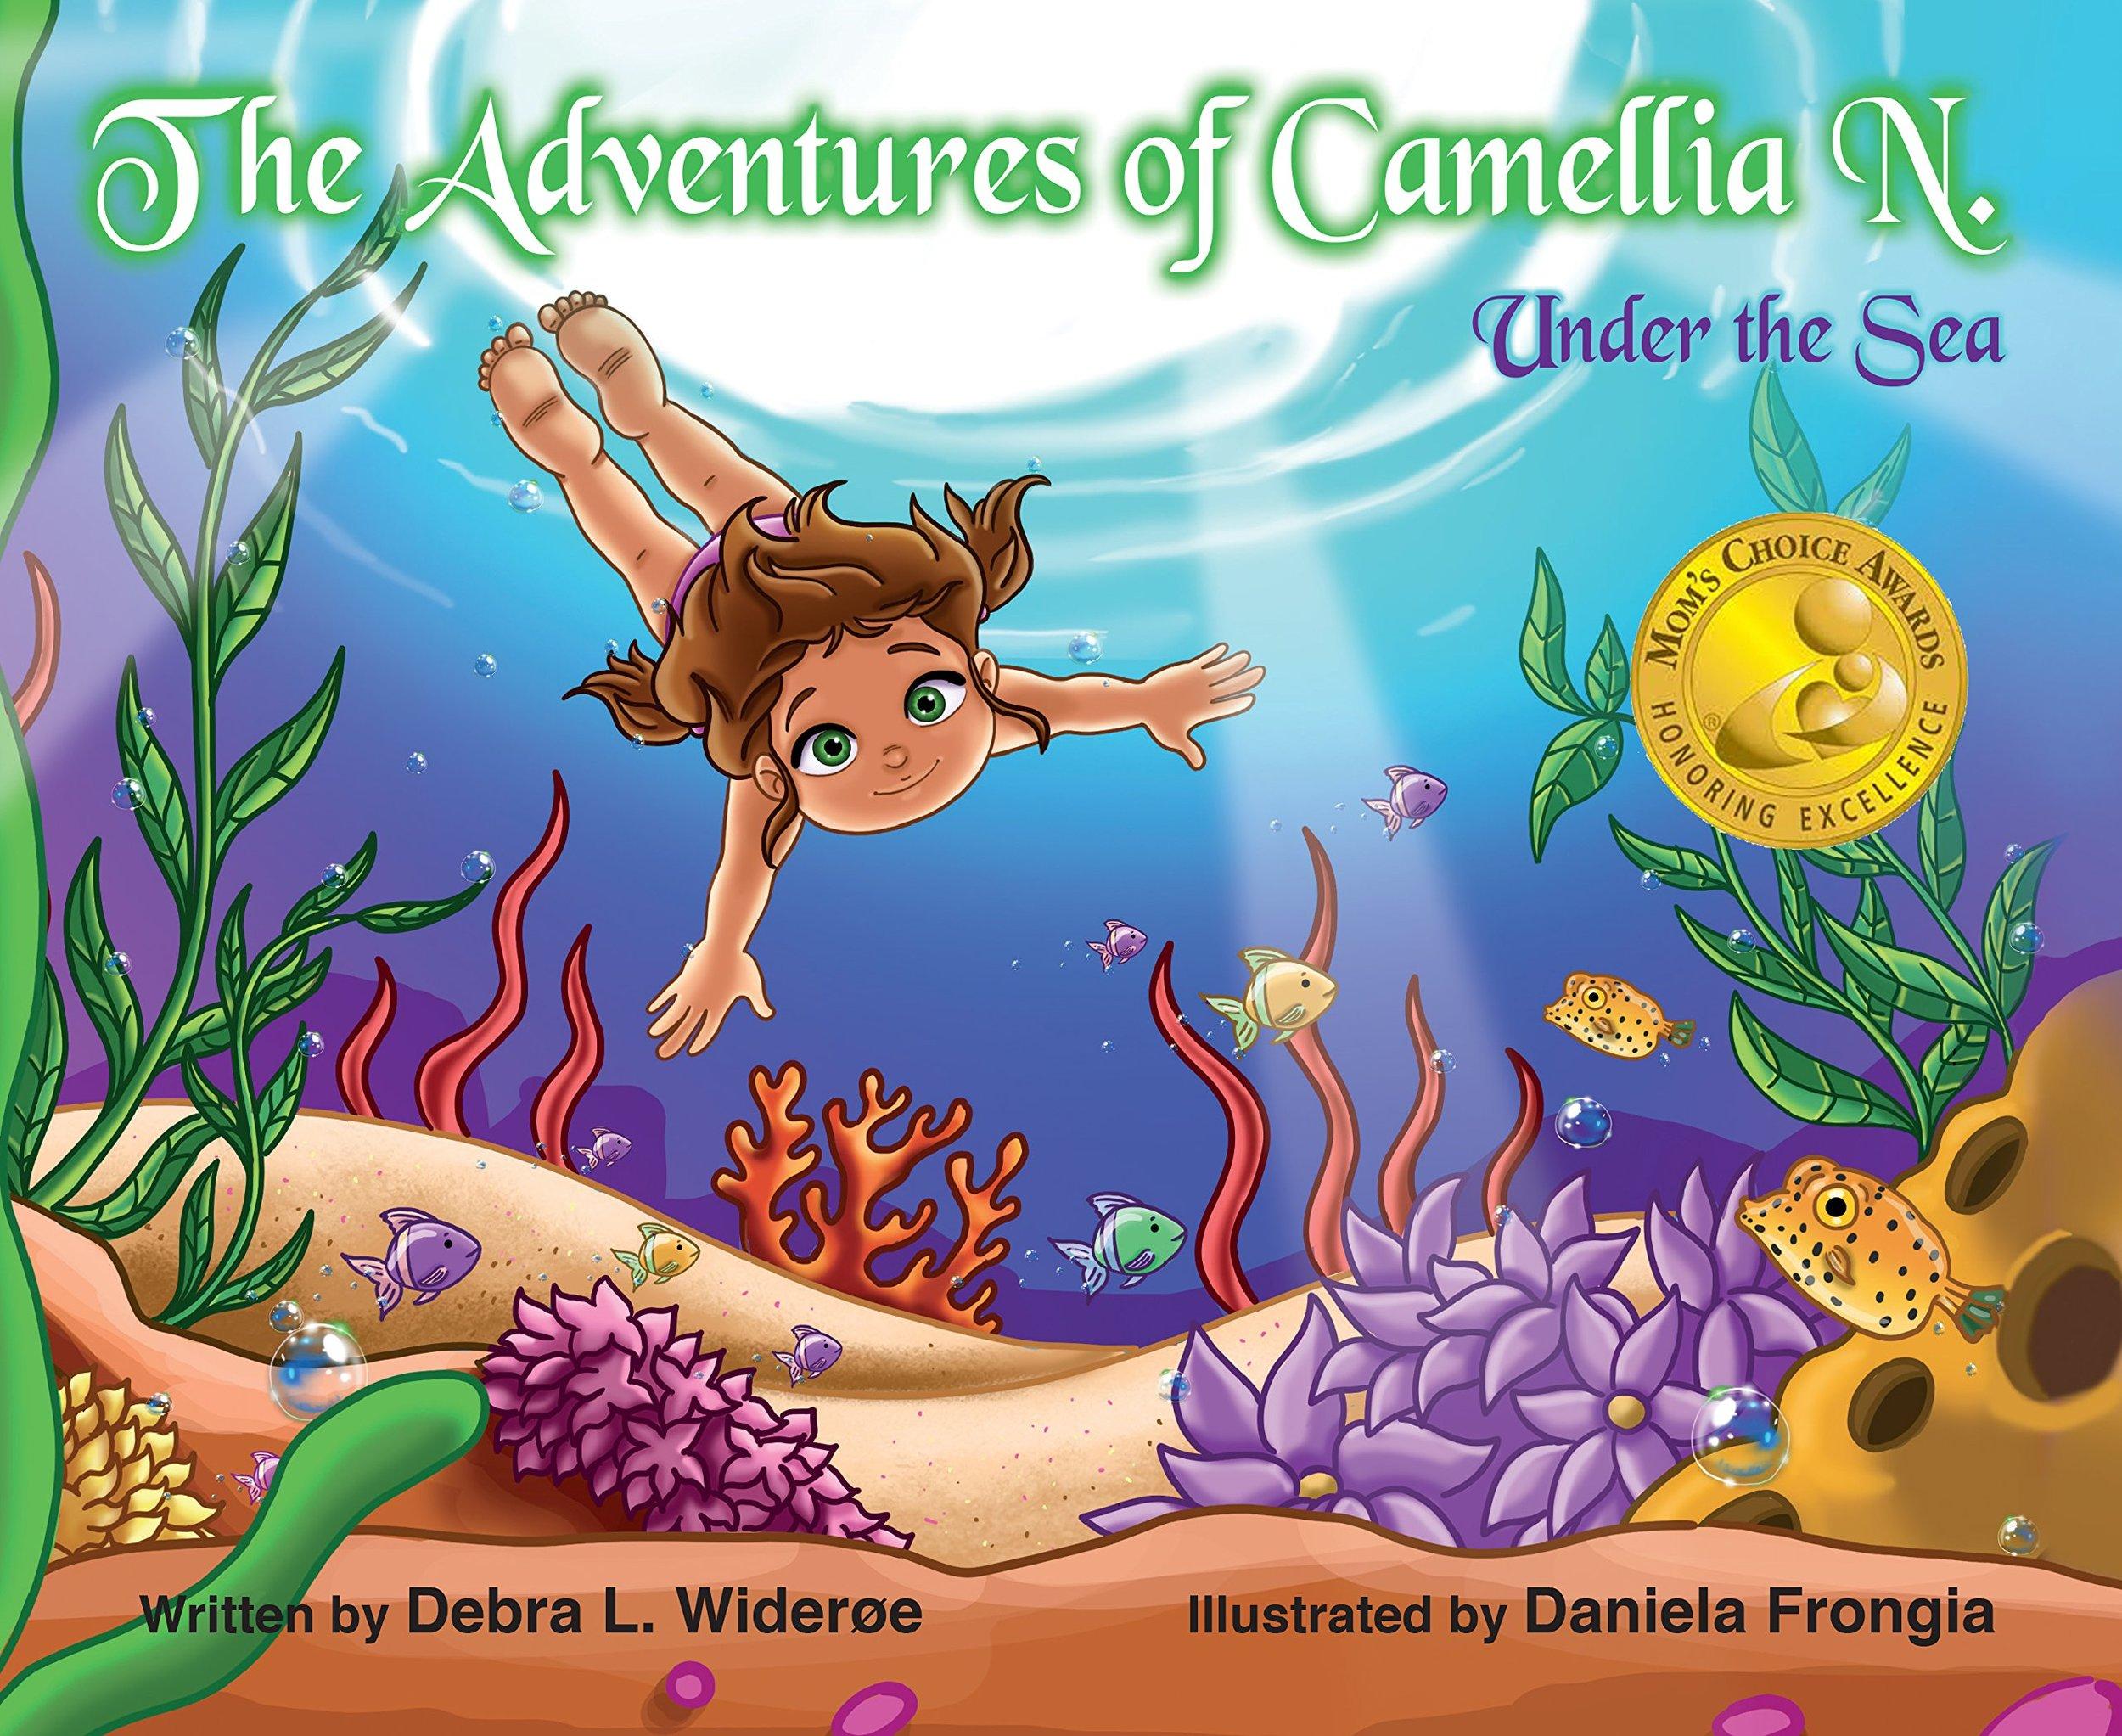 The Adventures of Camellia N. Under the Sea.jpg